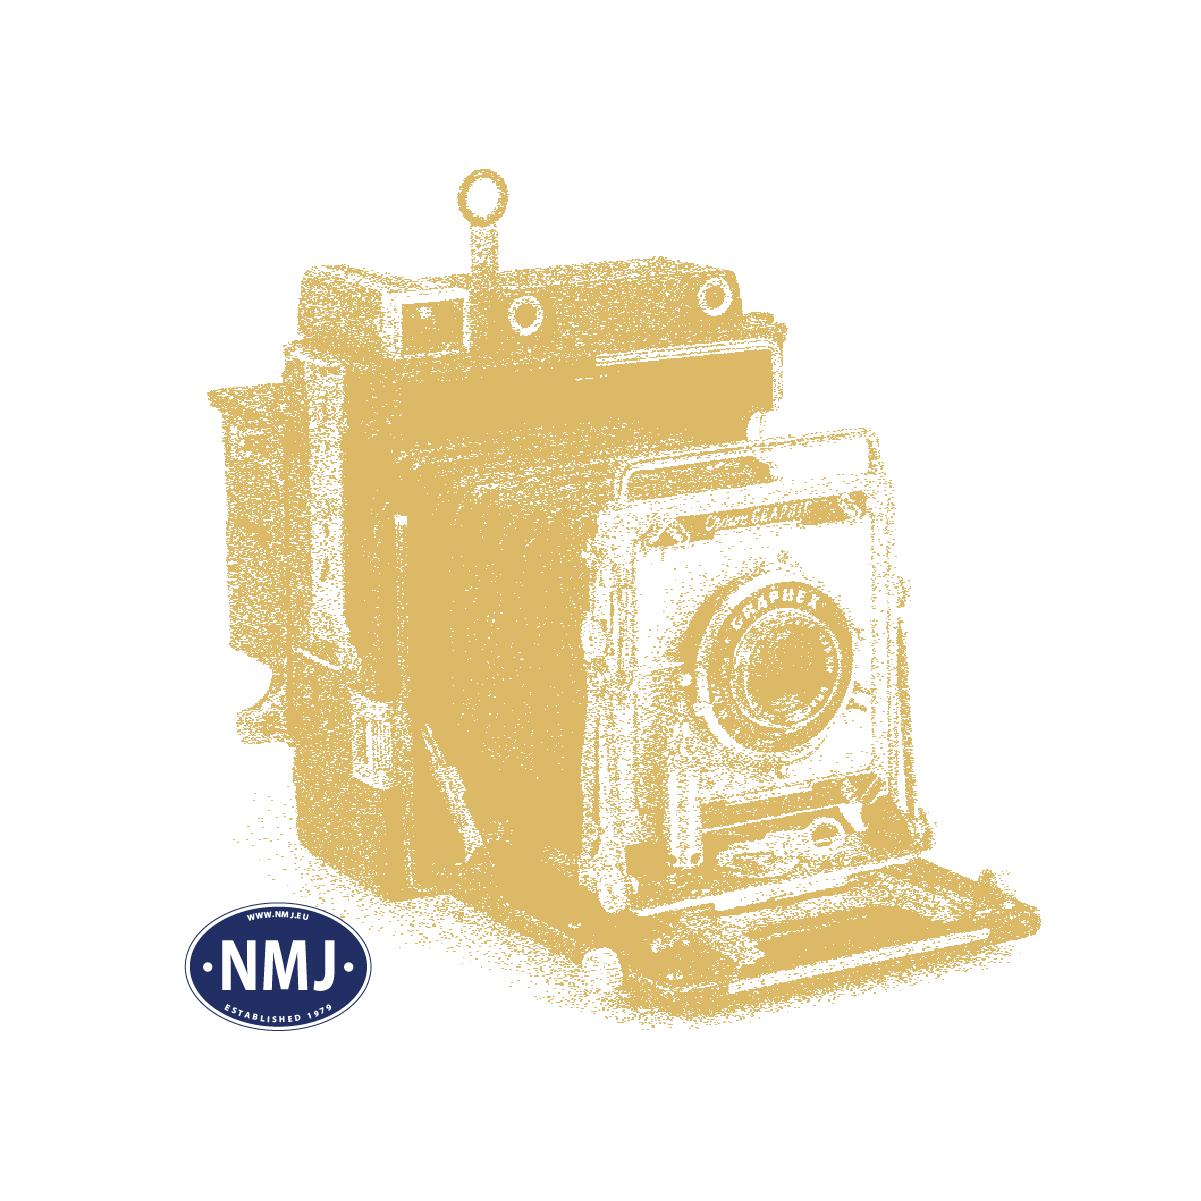 MBR55-1012 - Gressmatte #12, 30 x 40 Cm